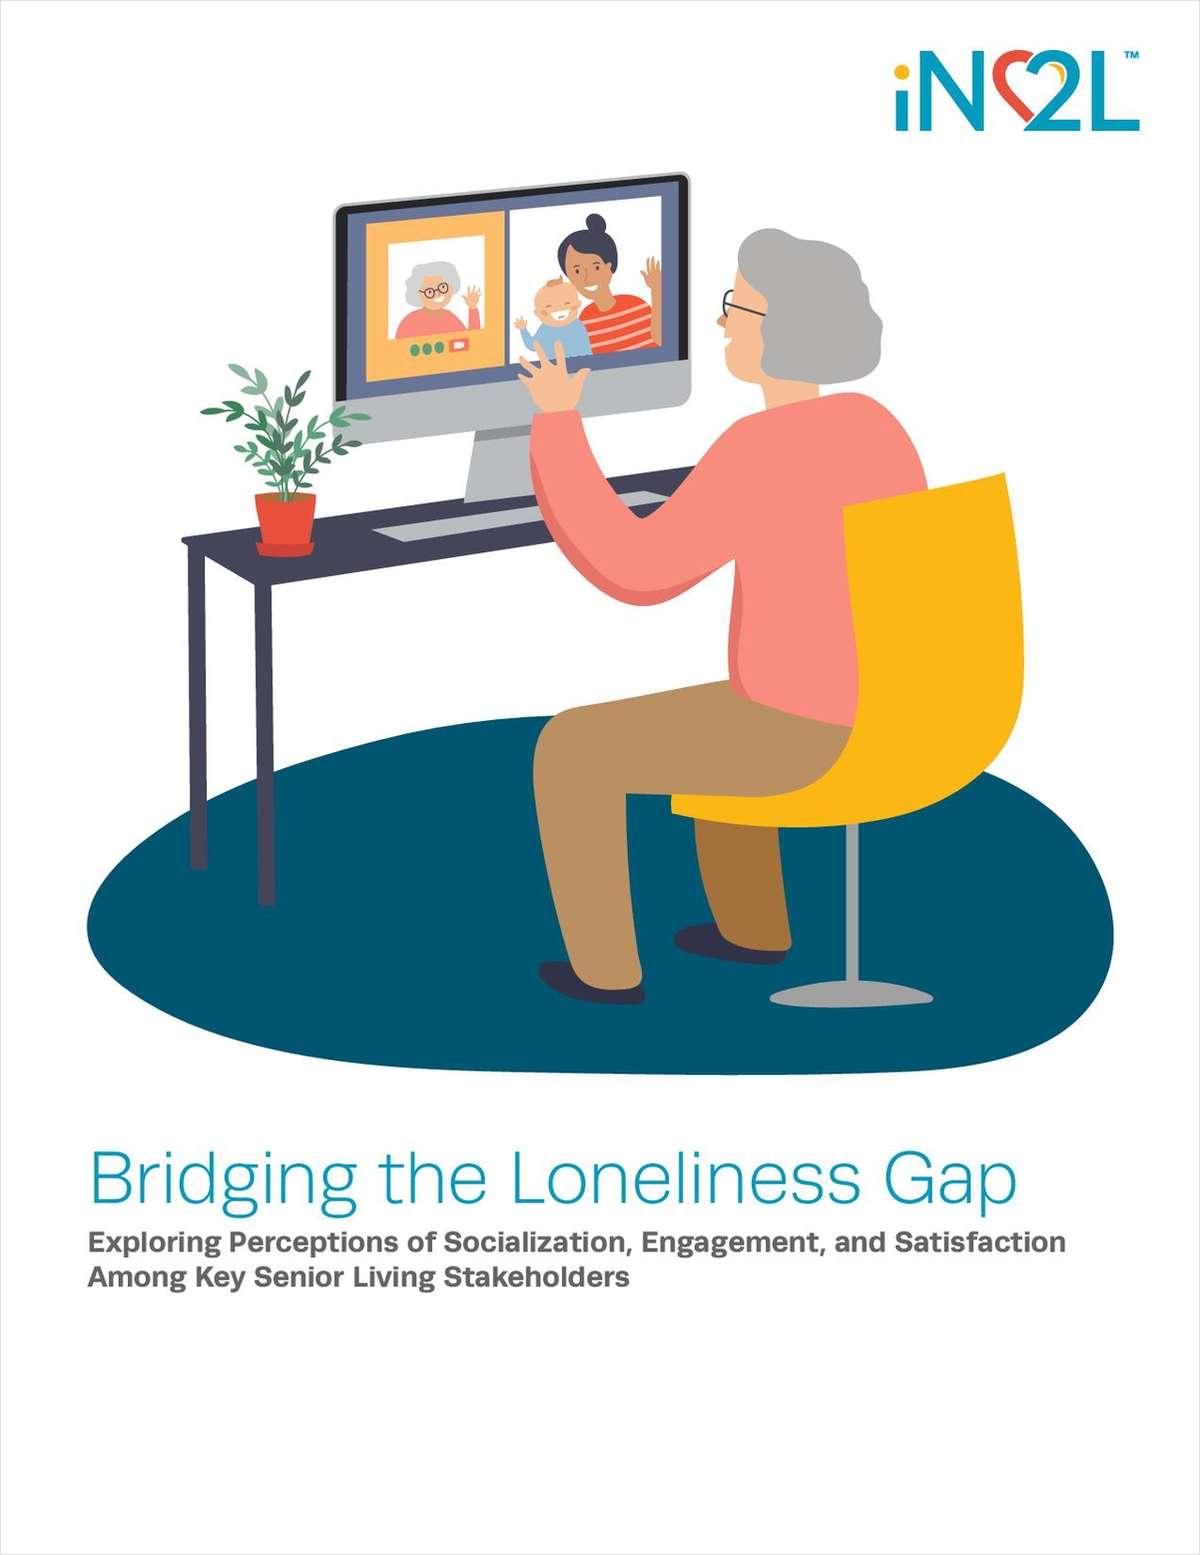 Bridging the Loneliness Gap